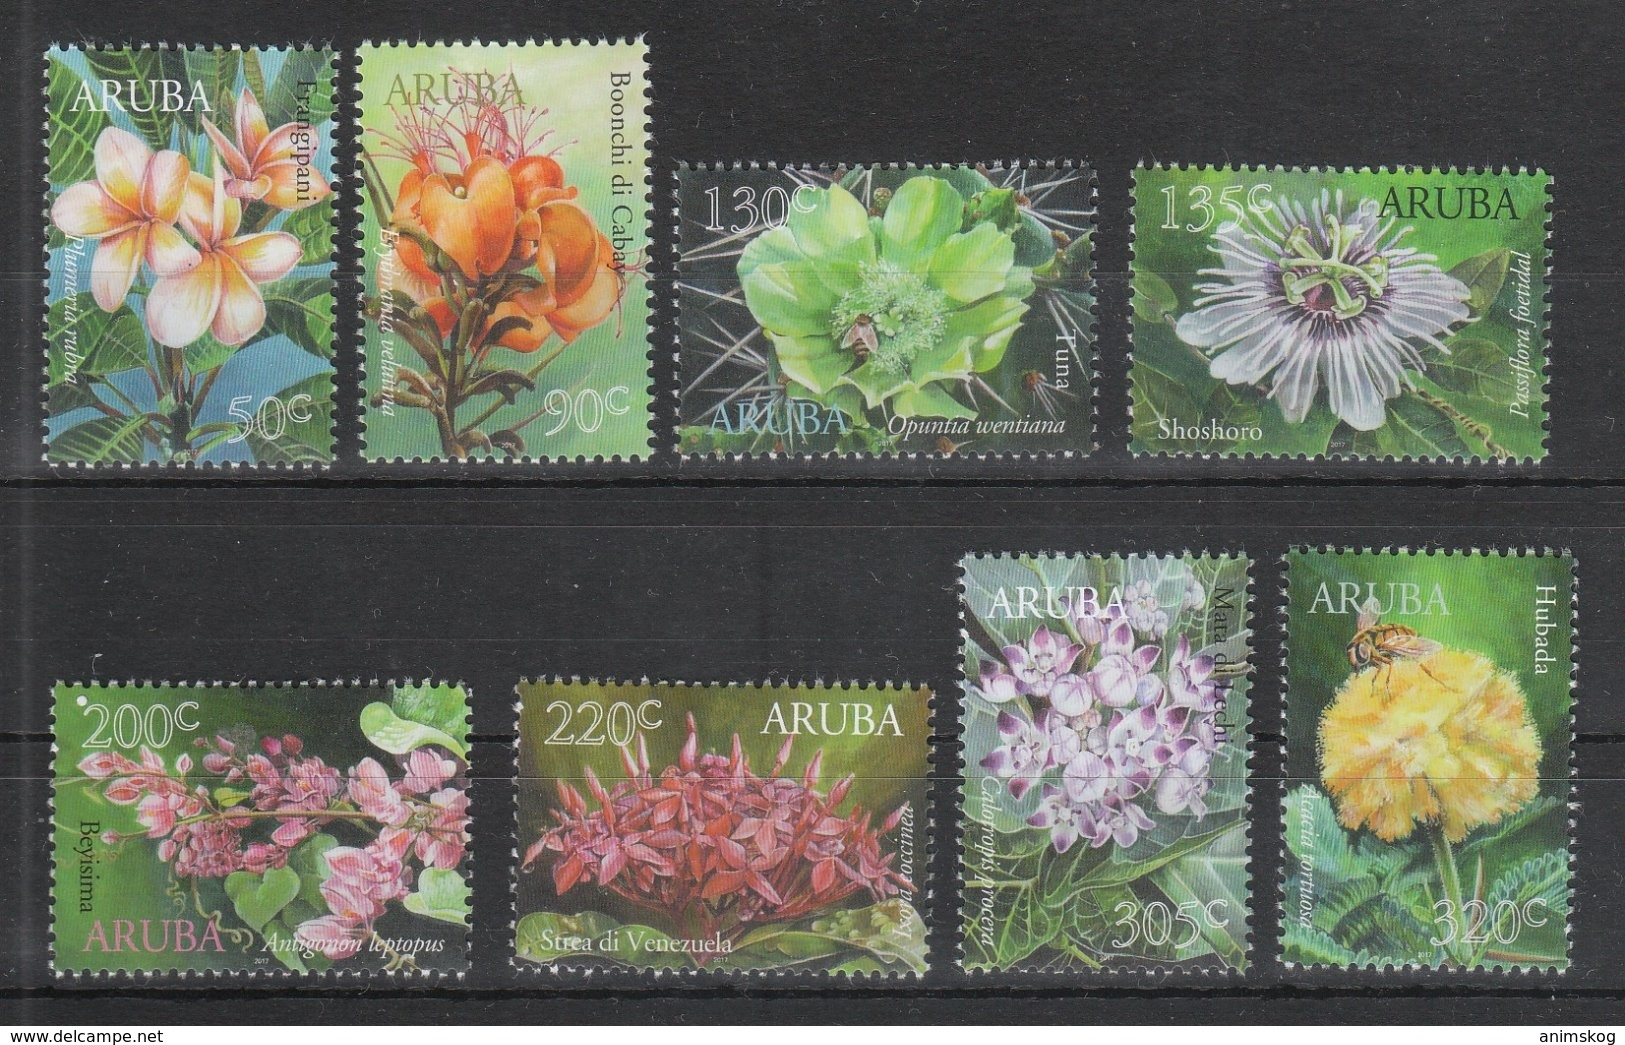 Aruba 2017**, Flora Von Aruba, Kaktus, Sukkulente / Aruba 2017, MNH, Aruban Flora, Cactus, Succulent - Sukkulenten